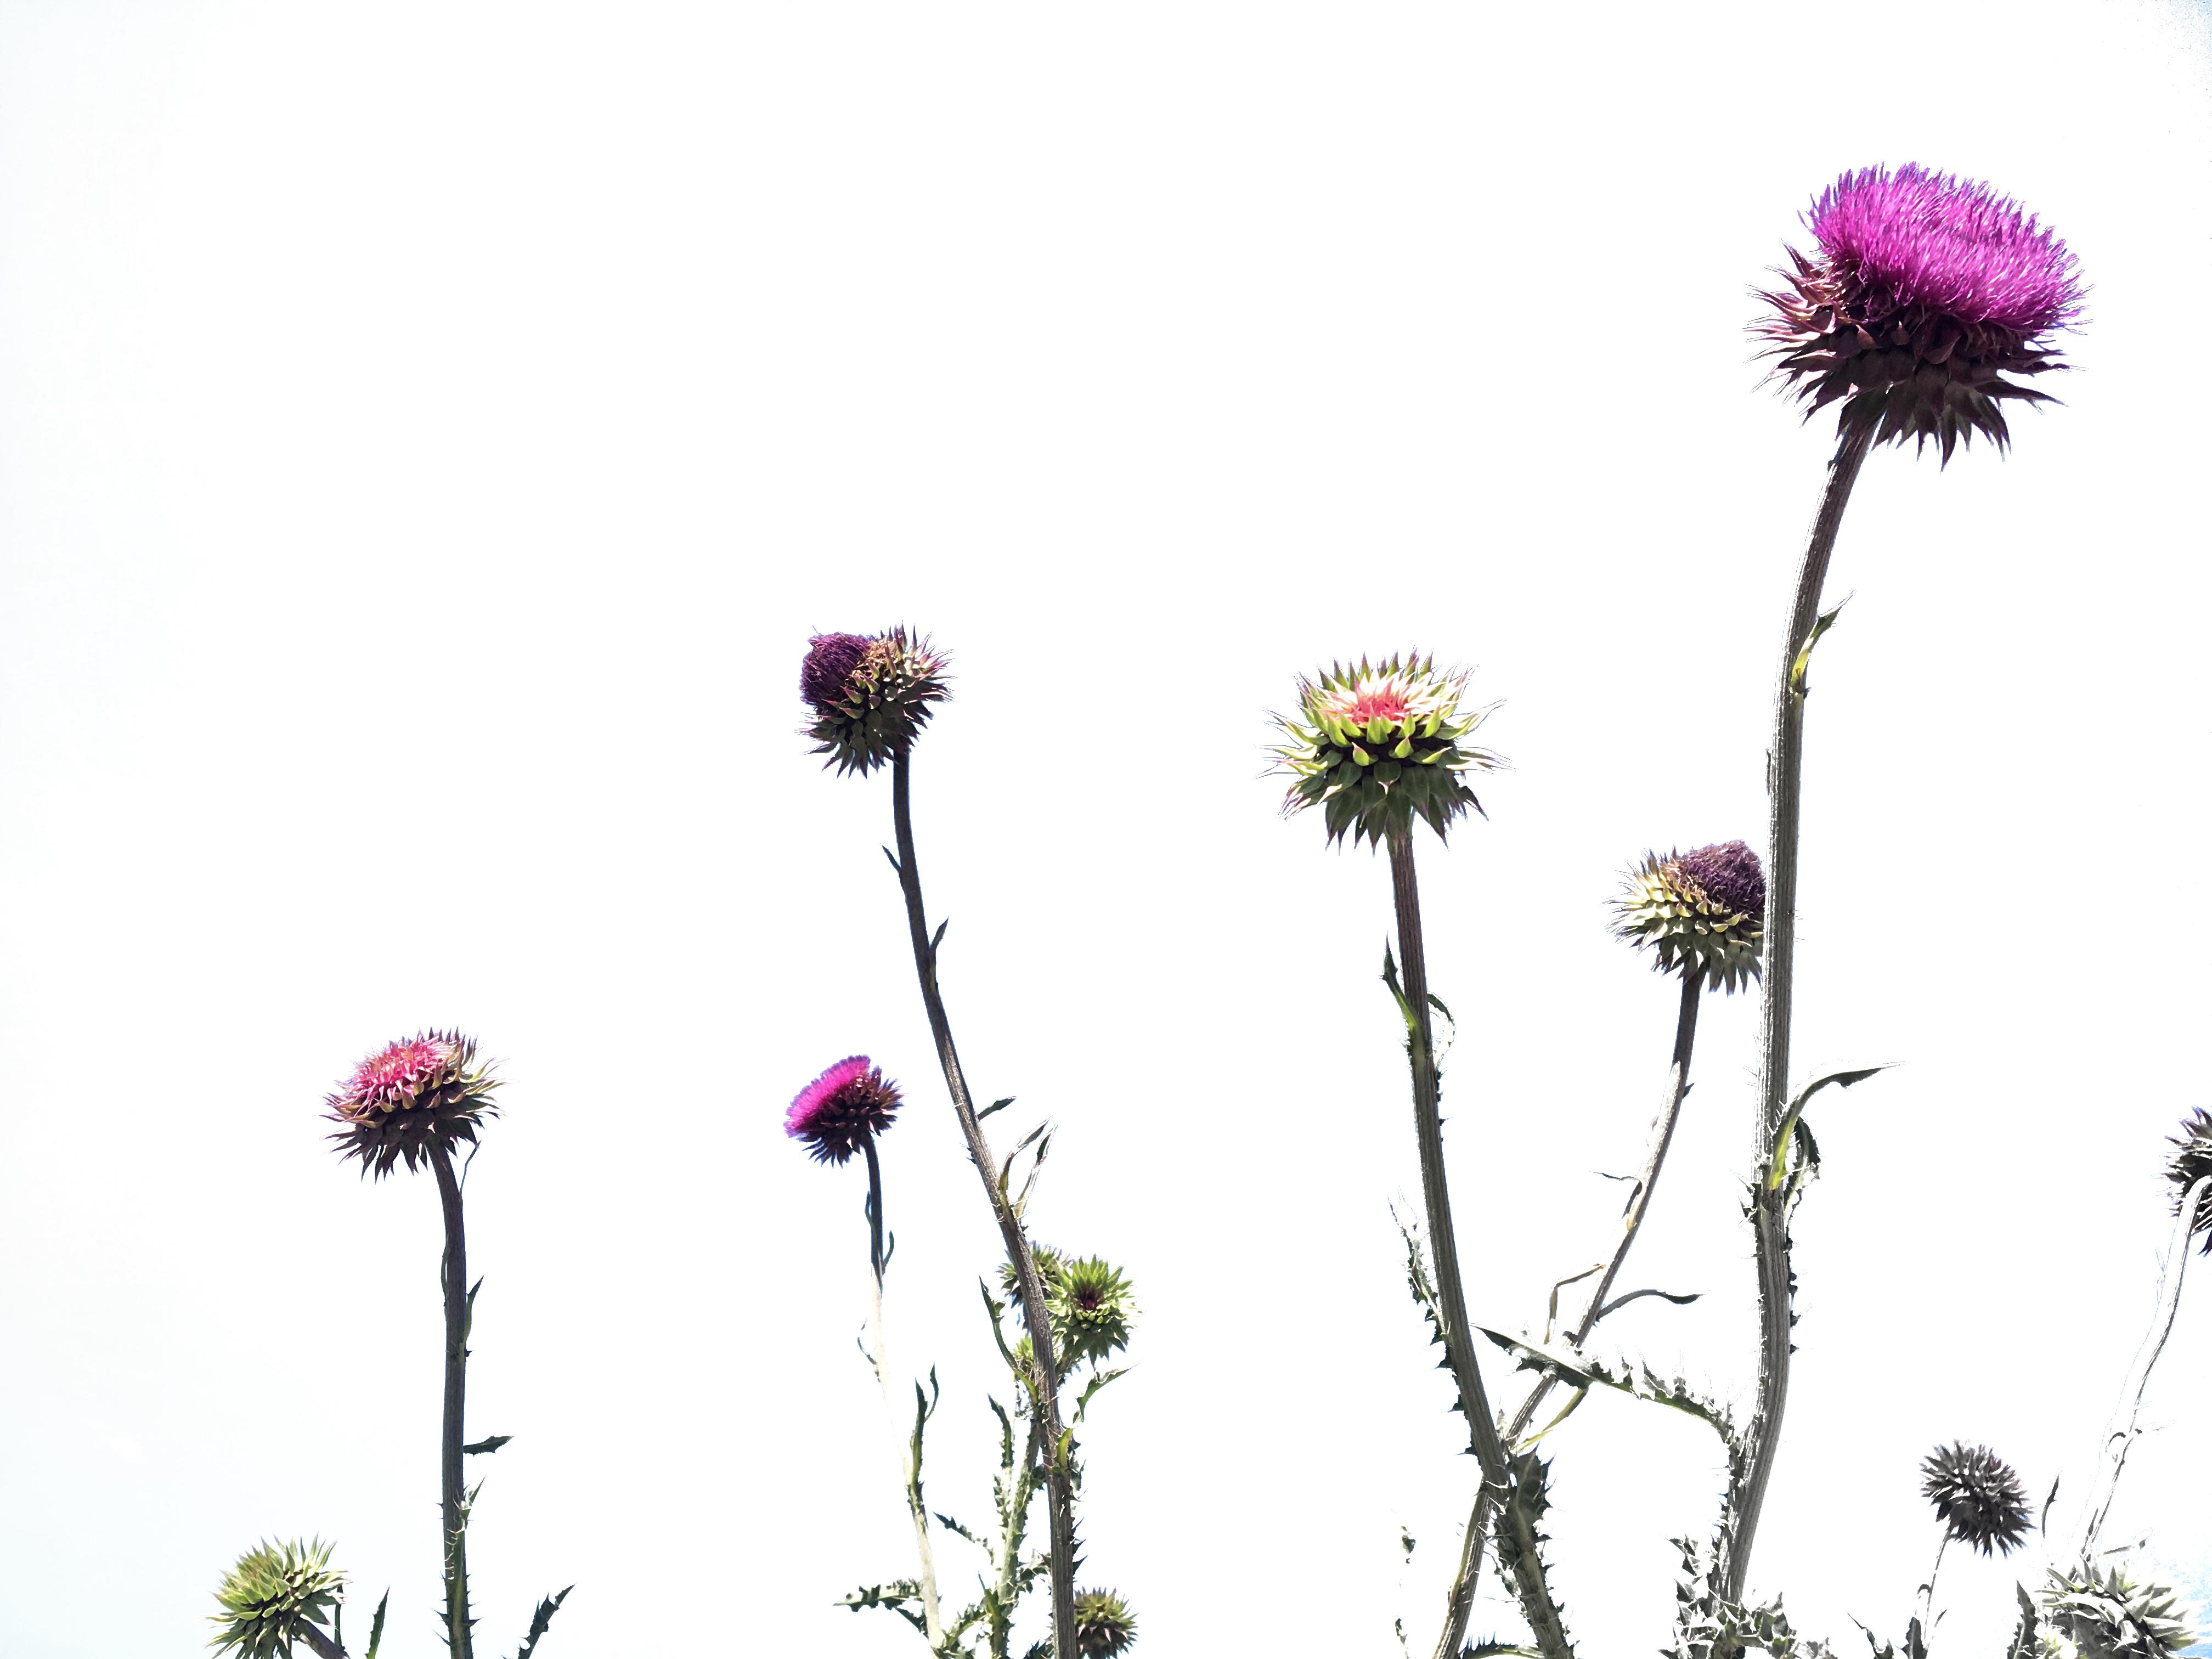 Pretty Flowers All in a Row